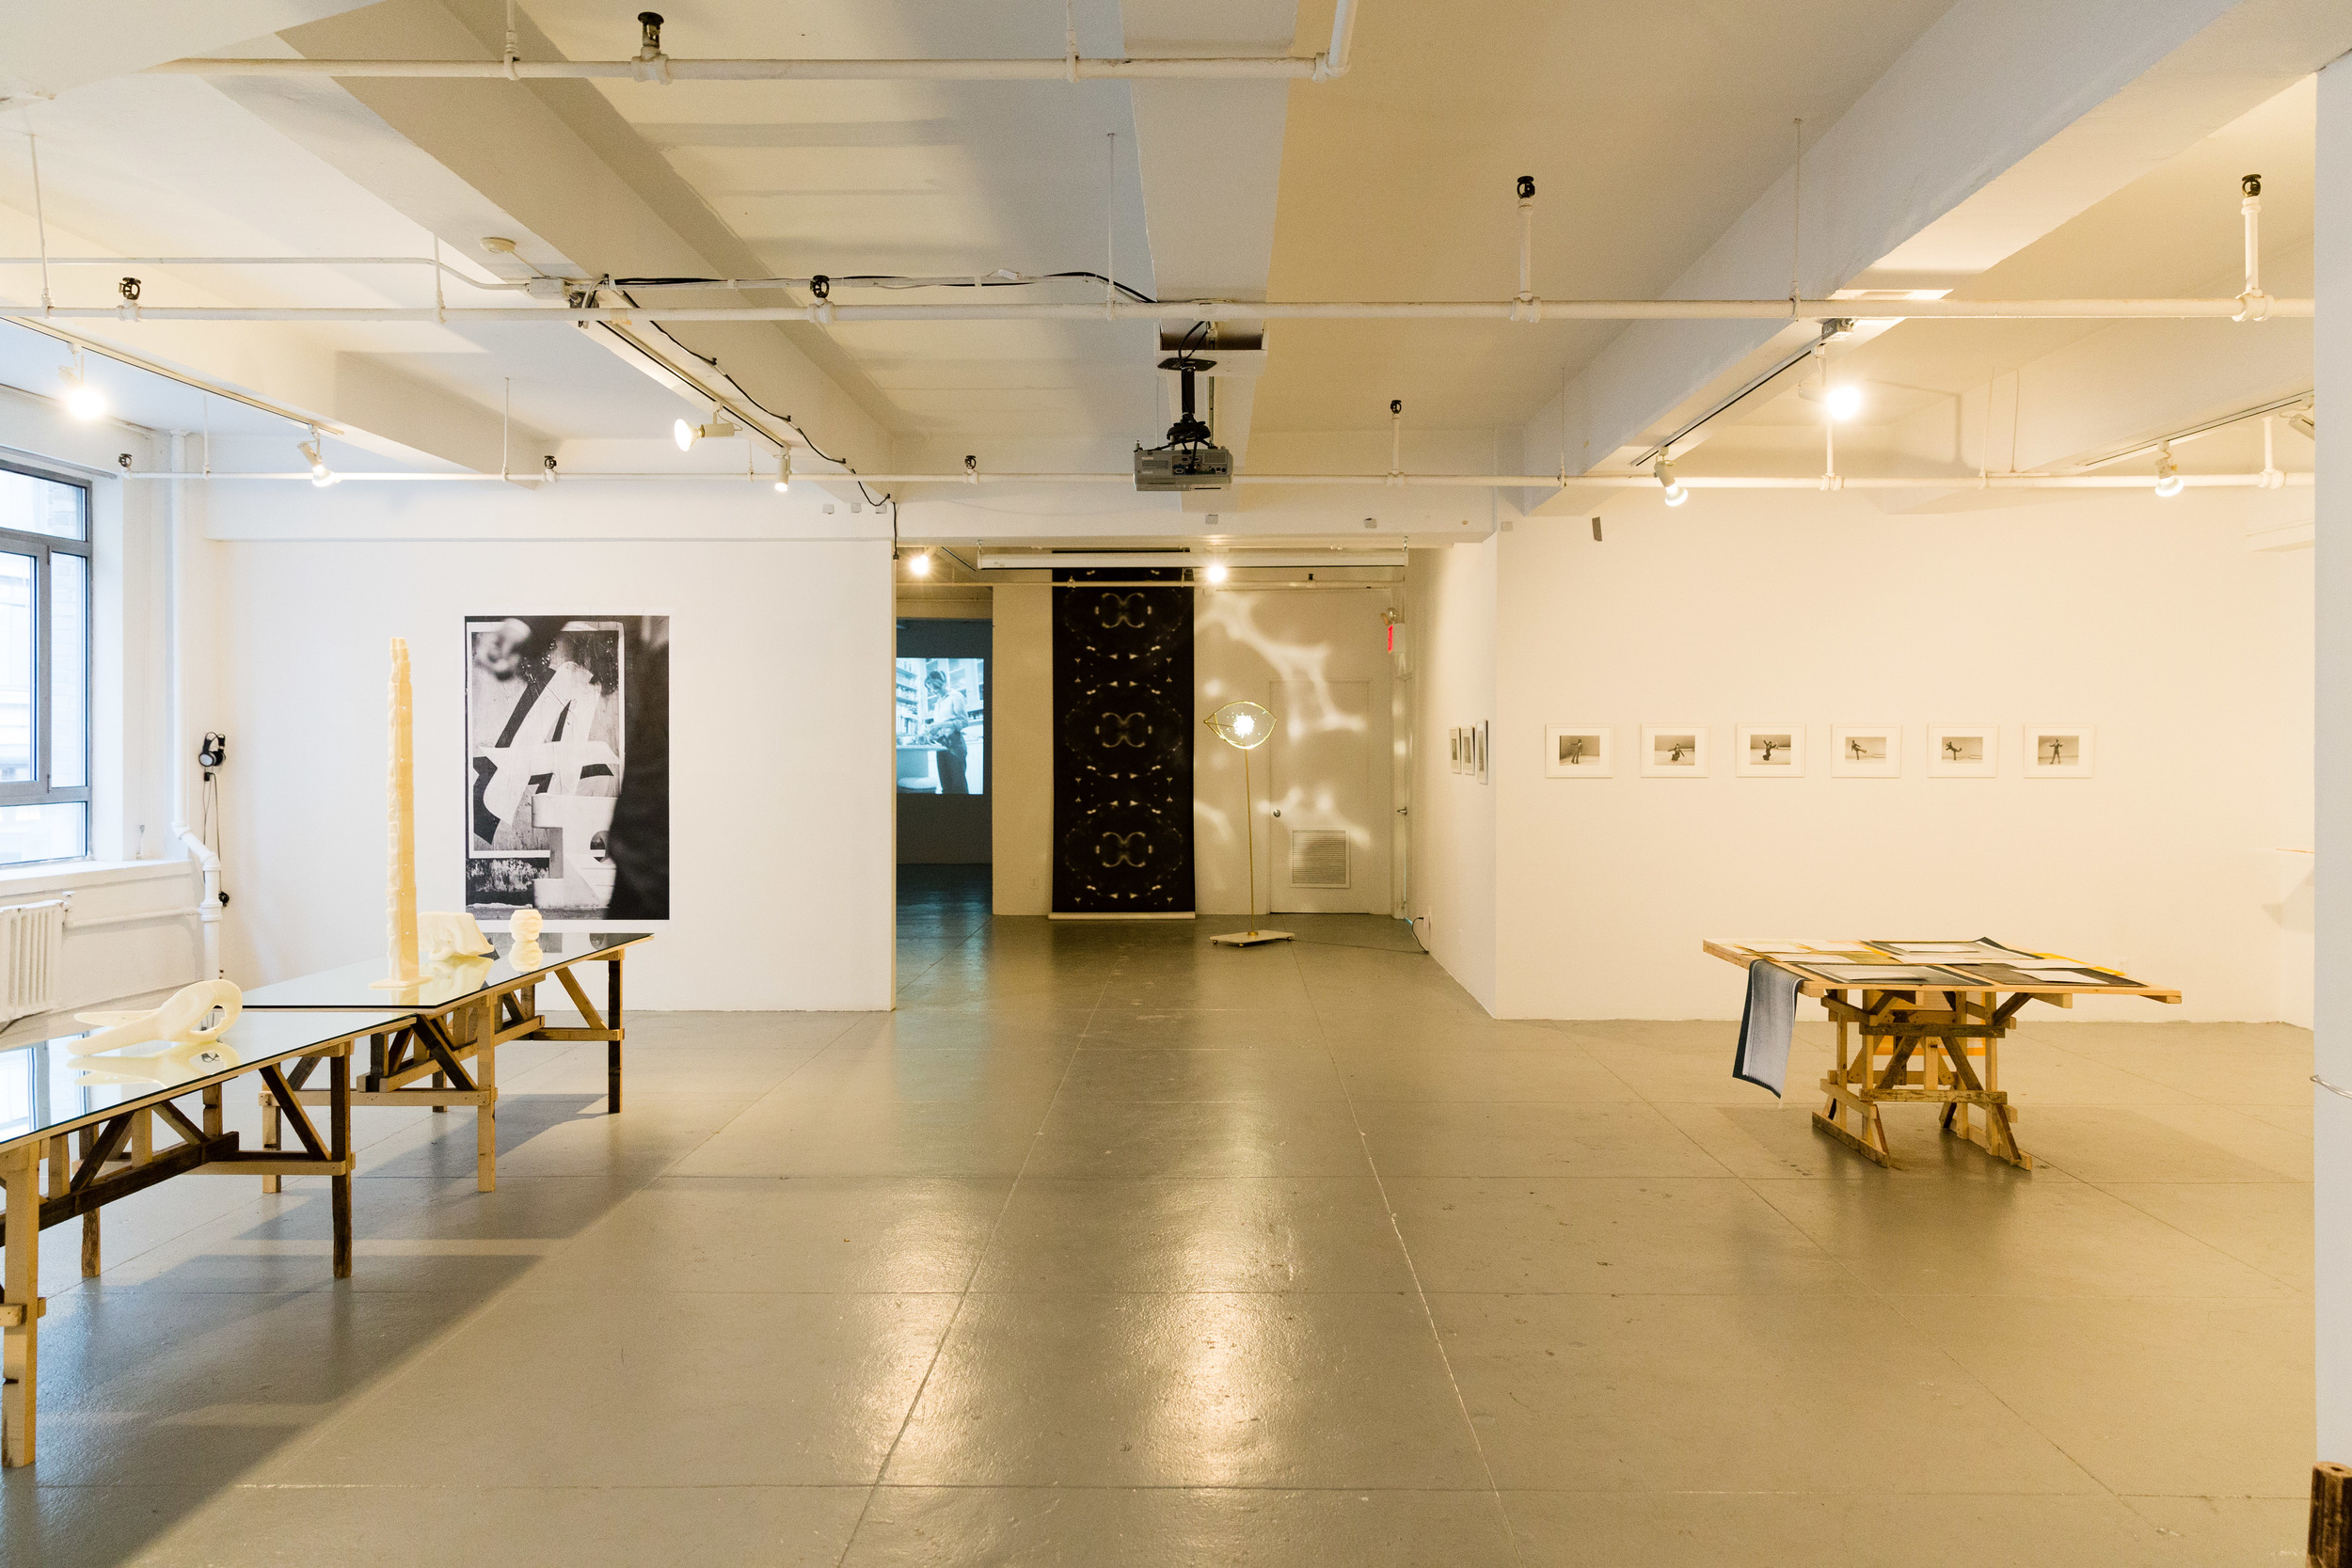 Accompaniment , curated by Kari Cwynar and Kendra Sullivan November 6 - December 19, 2015